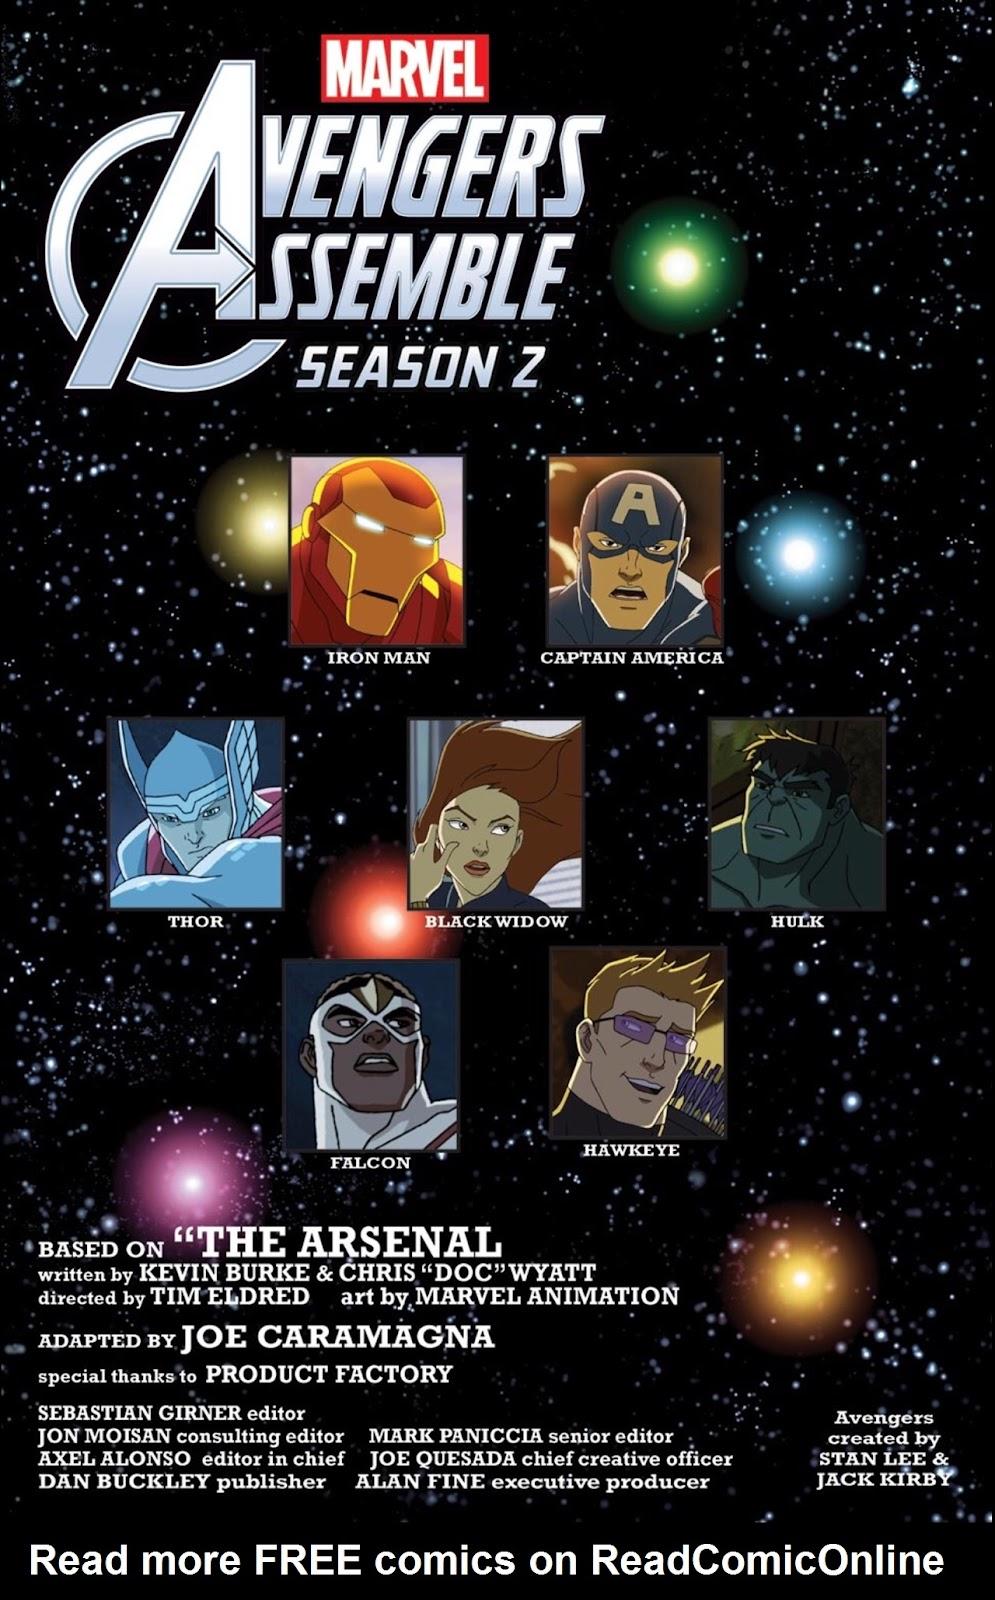 Read online Marvel Universe Avengers Assemble Season 2 comic -  Issue #1 - 7